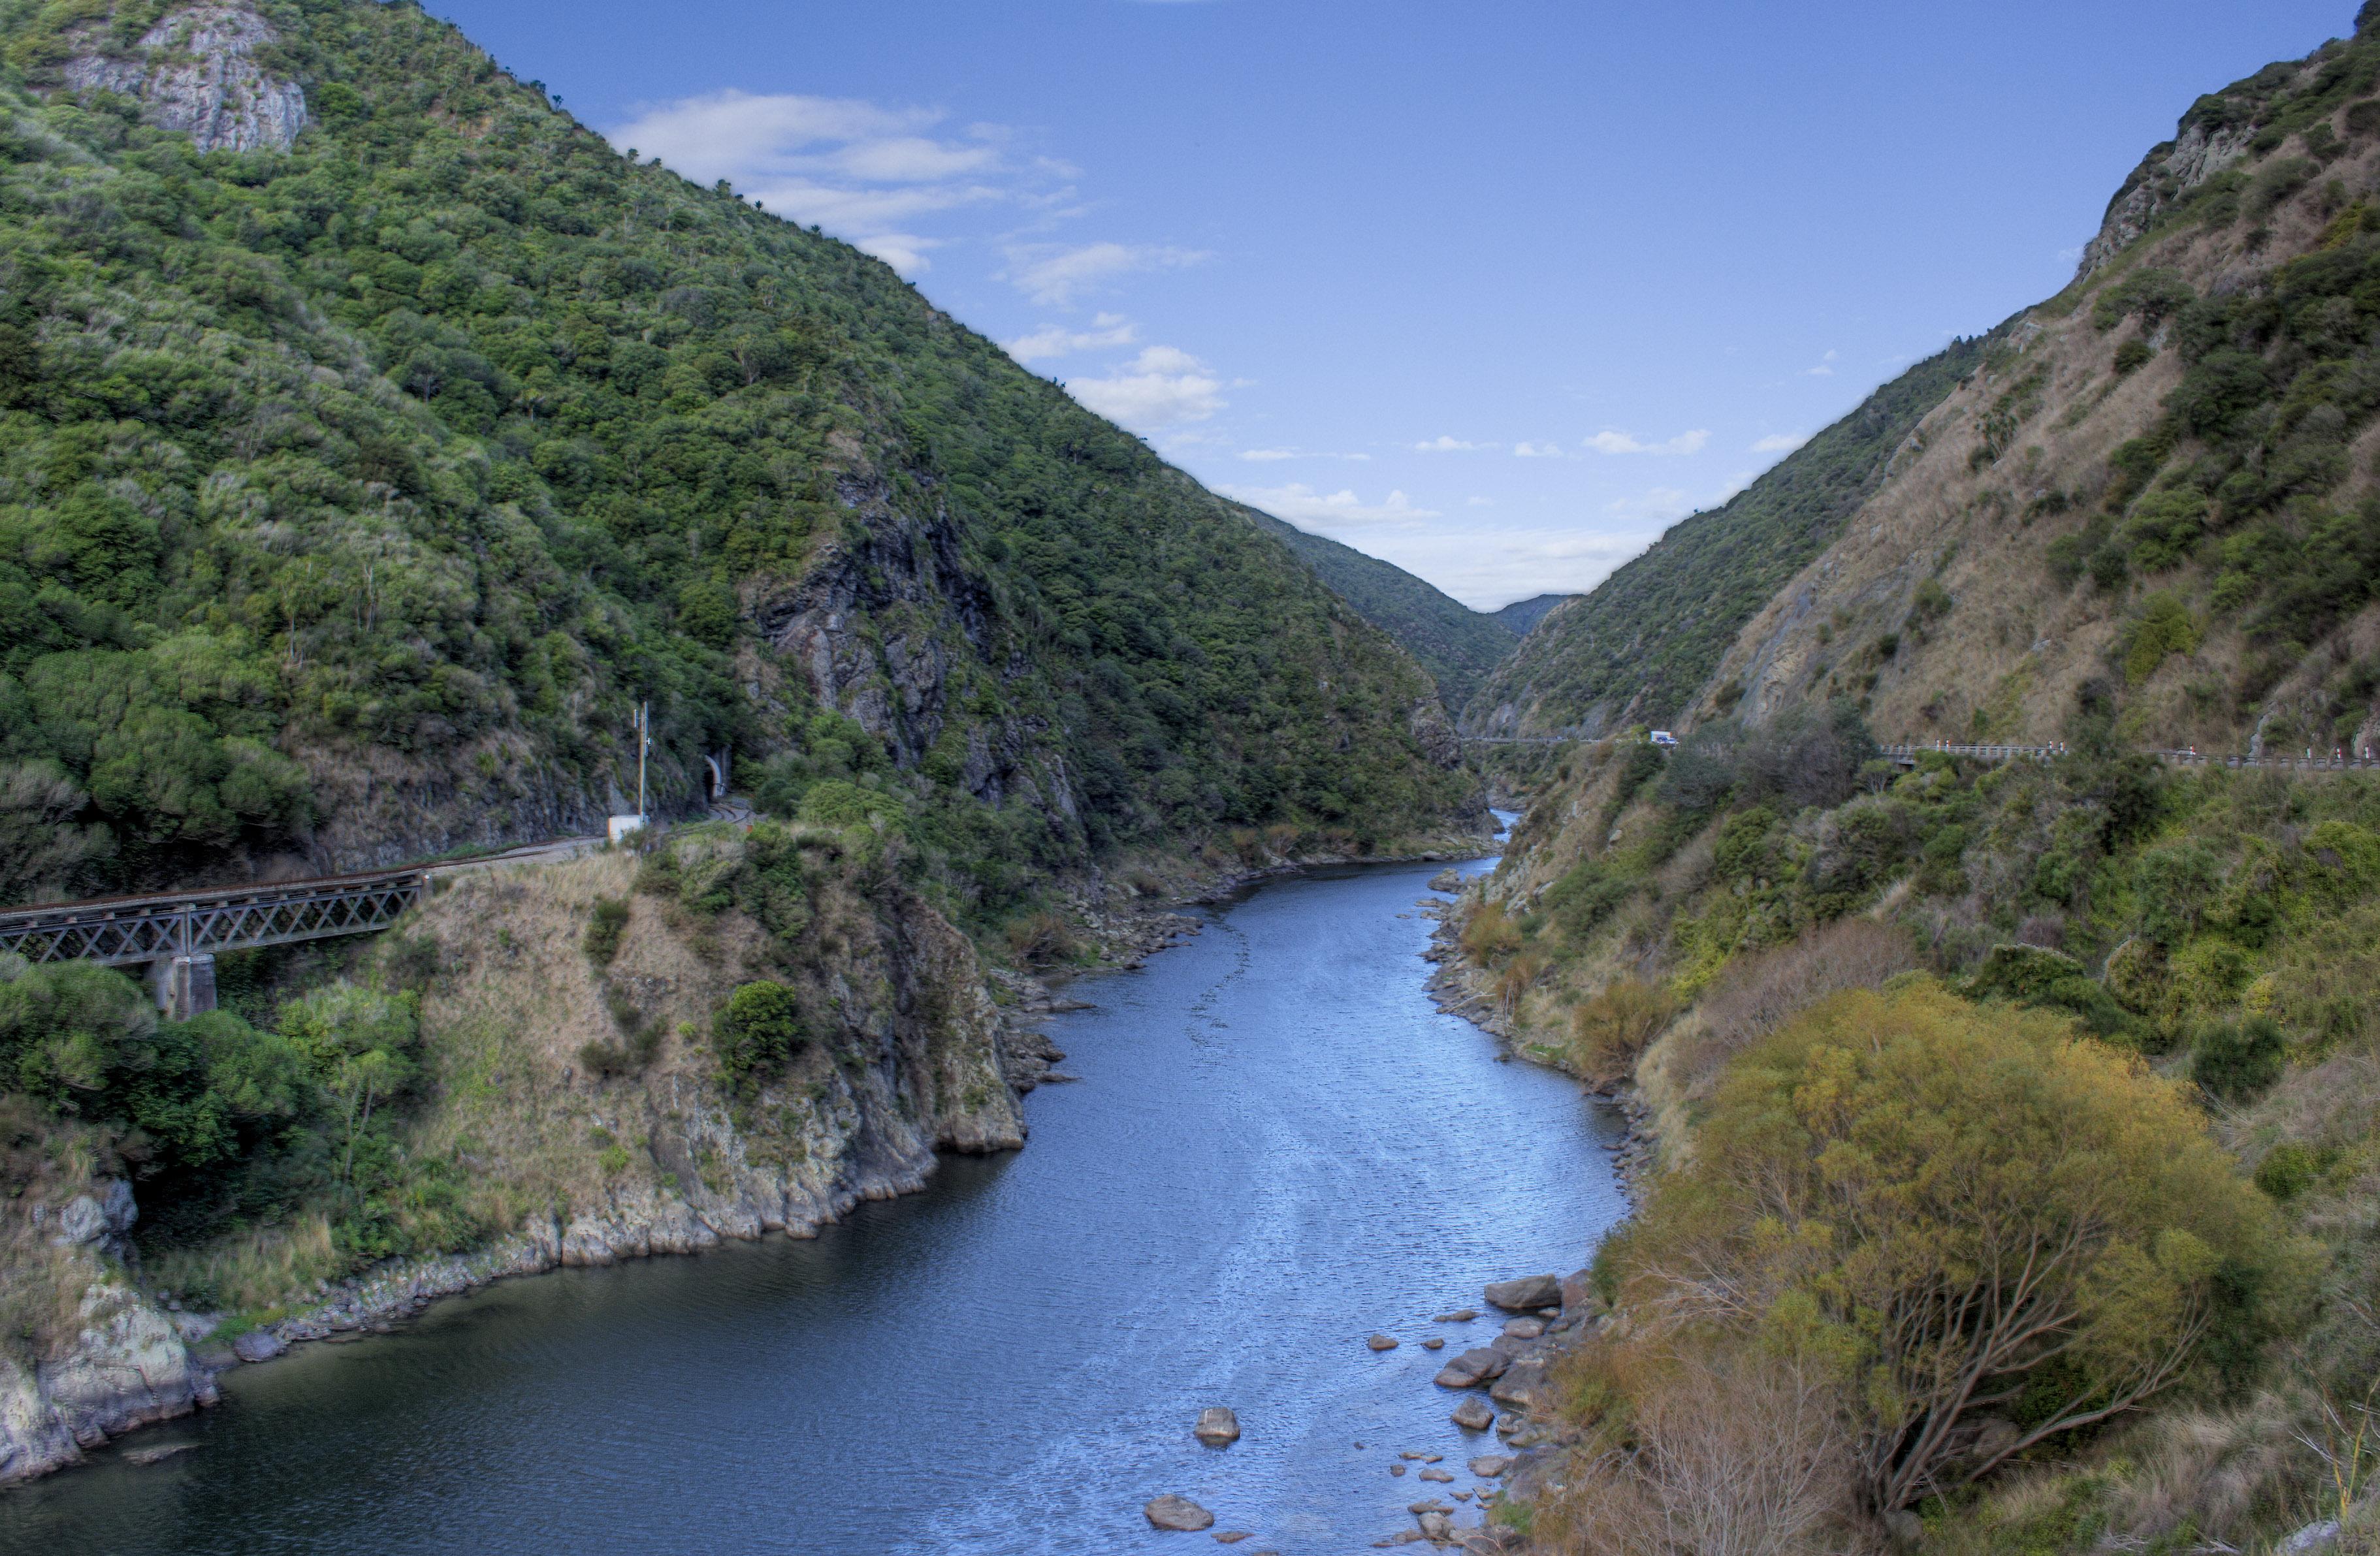 No end in sight for Manawatu Gorge road | Stuff.co.nz